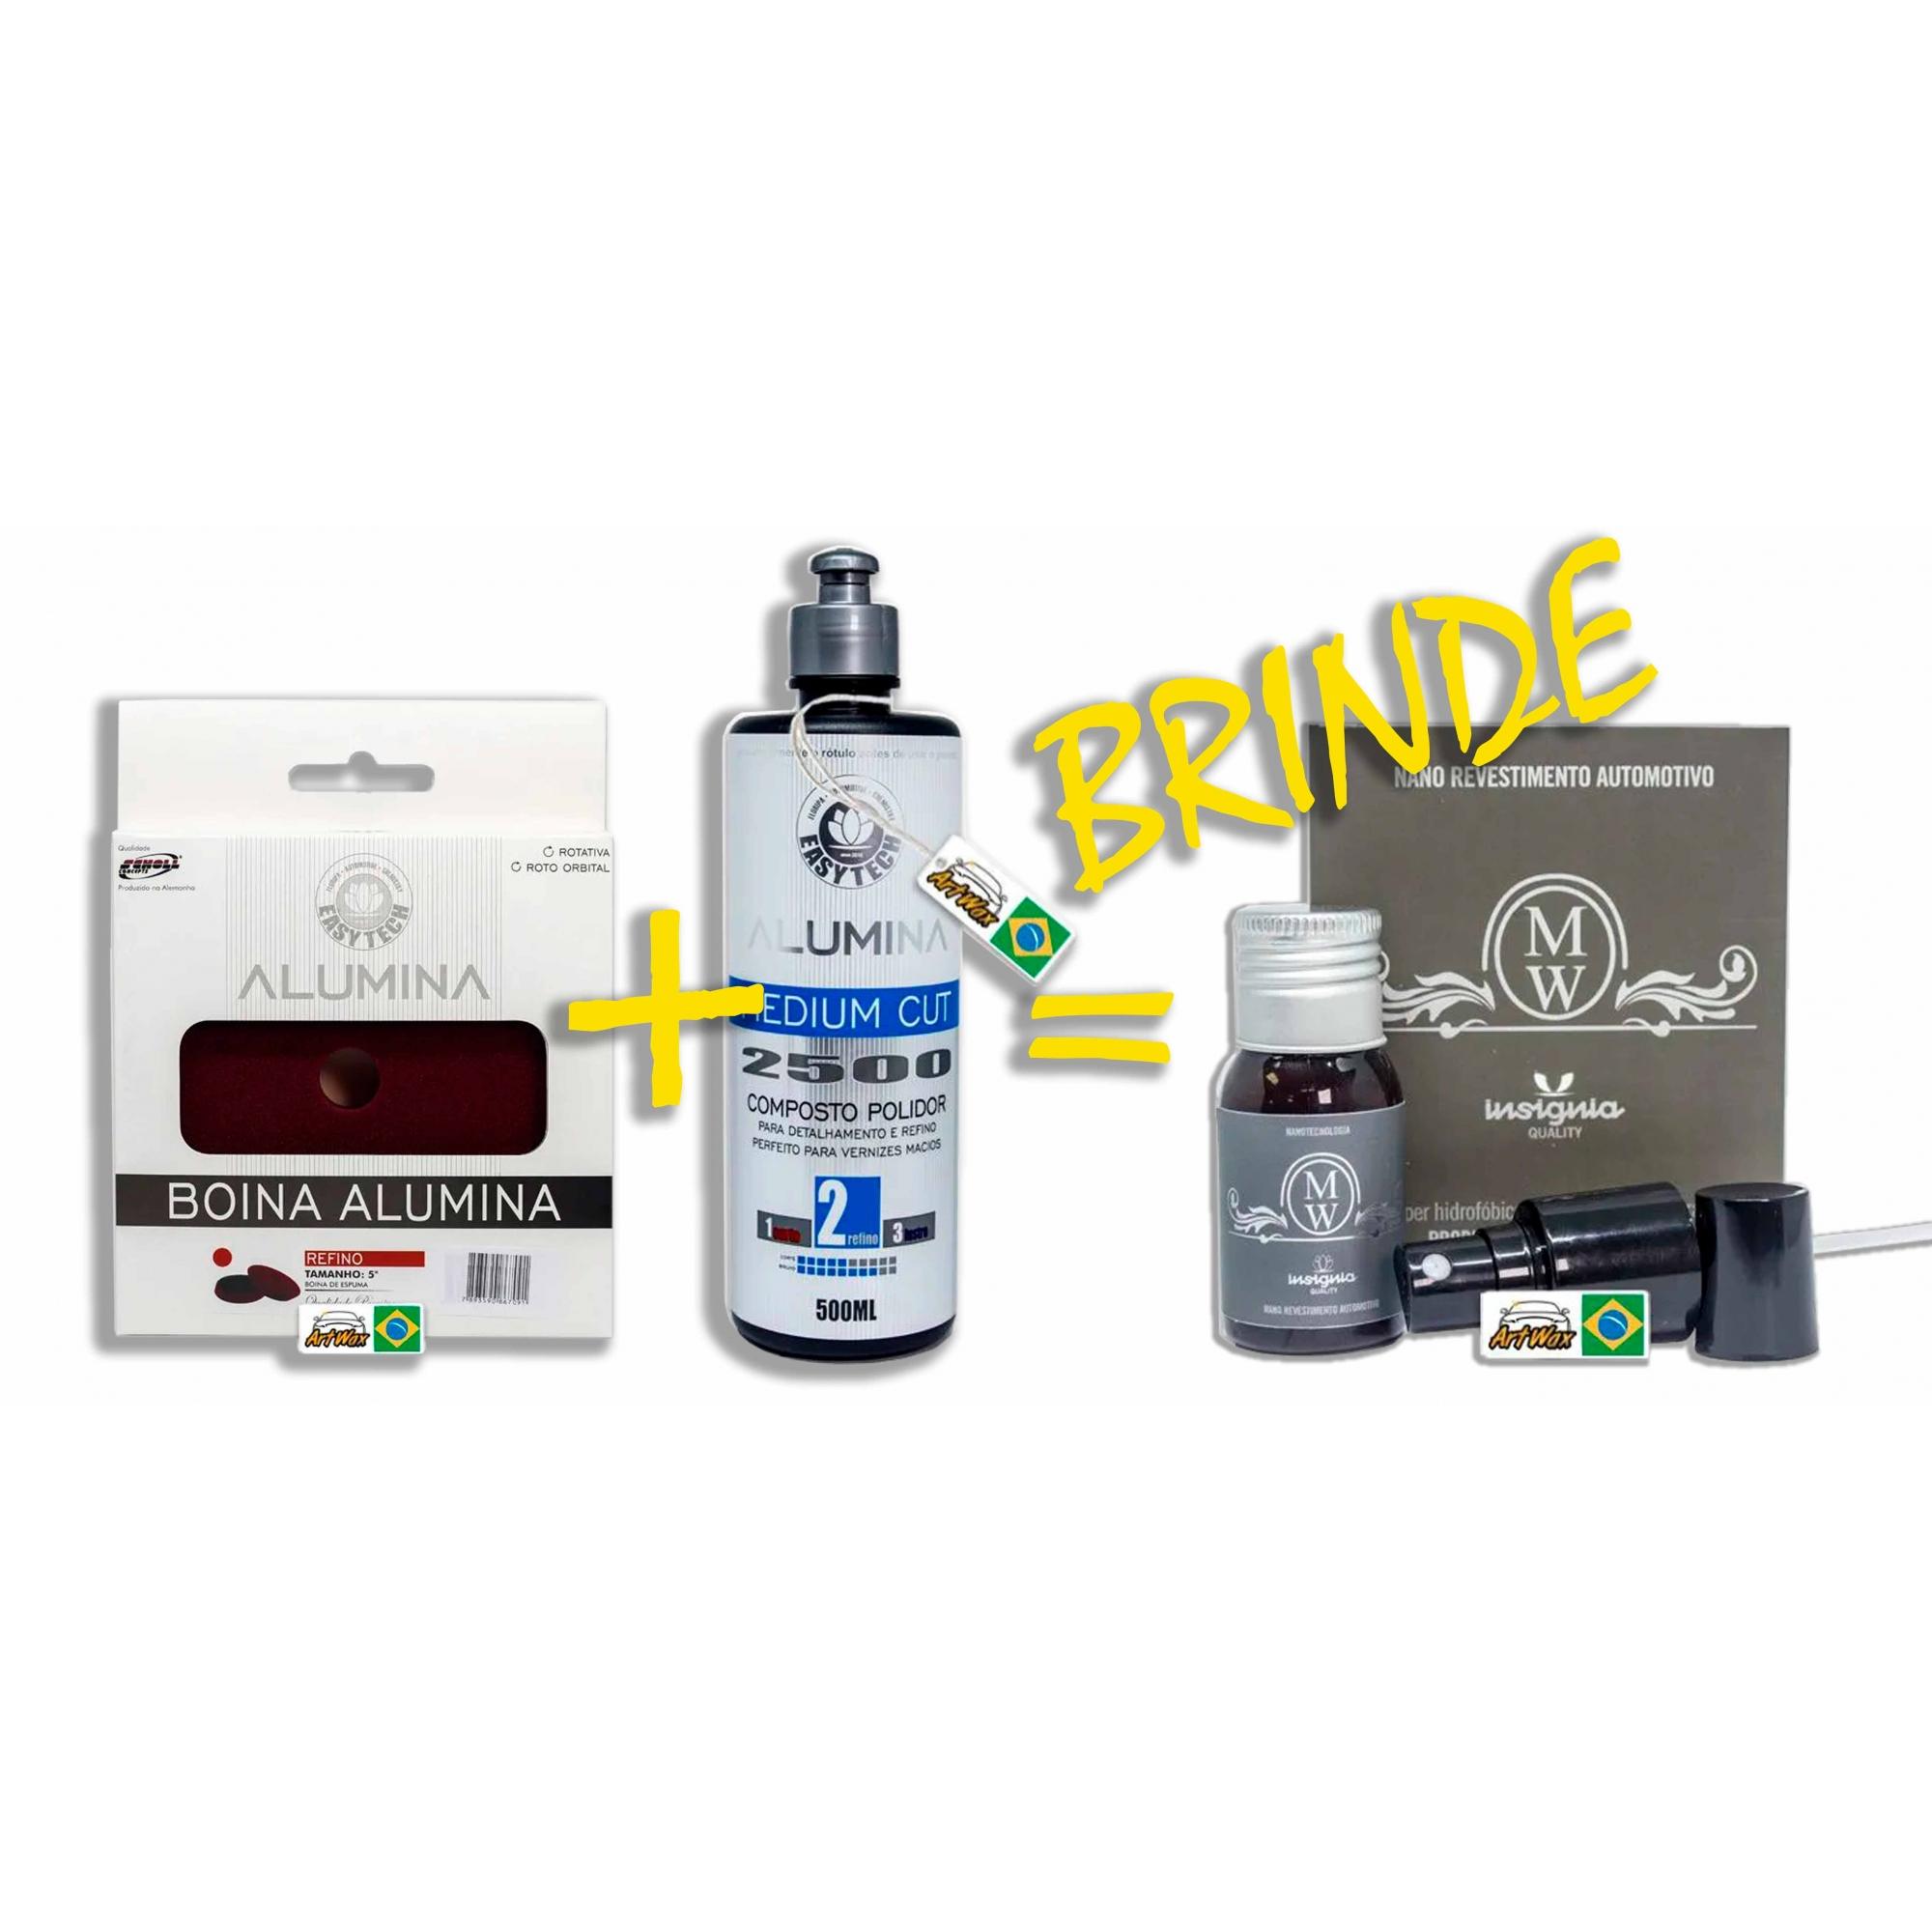 Kit Alumina Medium Cut + Boina Alumina Refino 140mm - Brinde Insignia Motors Wash 30ml Easytech